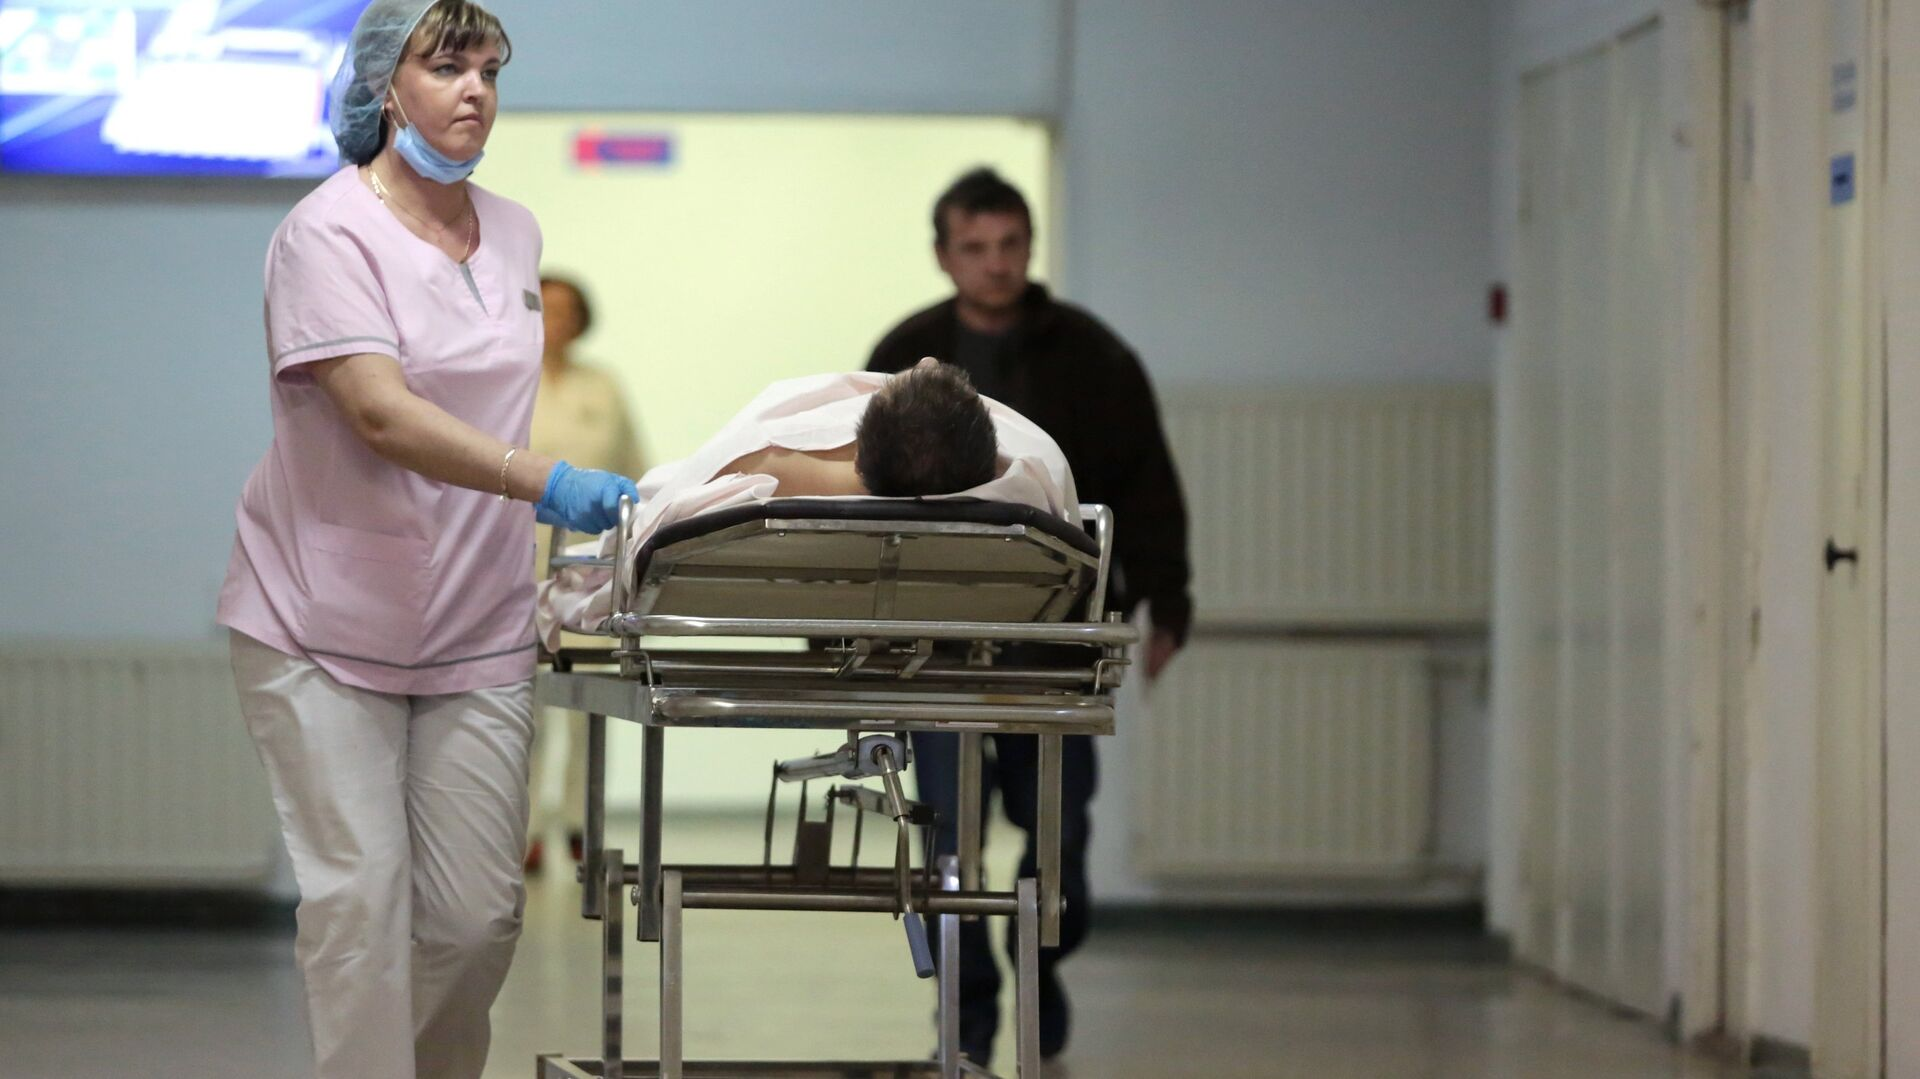 Сотрудница транспортируют пациента в НИИ скорой помощи имени И.И. Джанелидзе в Санкт-Петербурге - РИА Новости, 1920, 12.10.2021